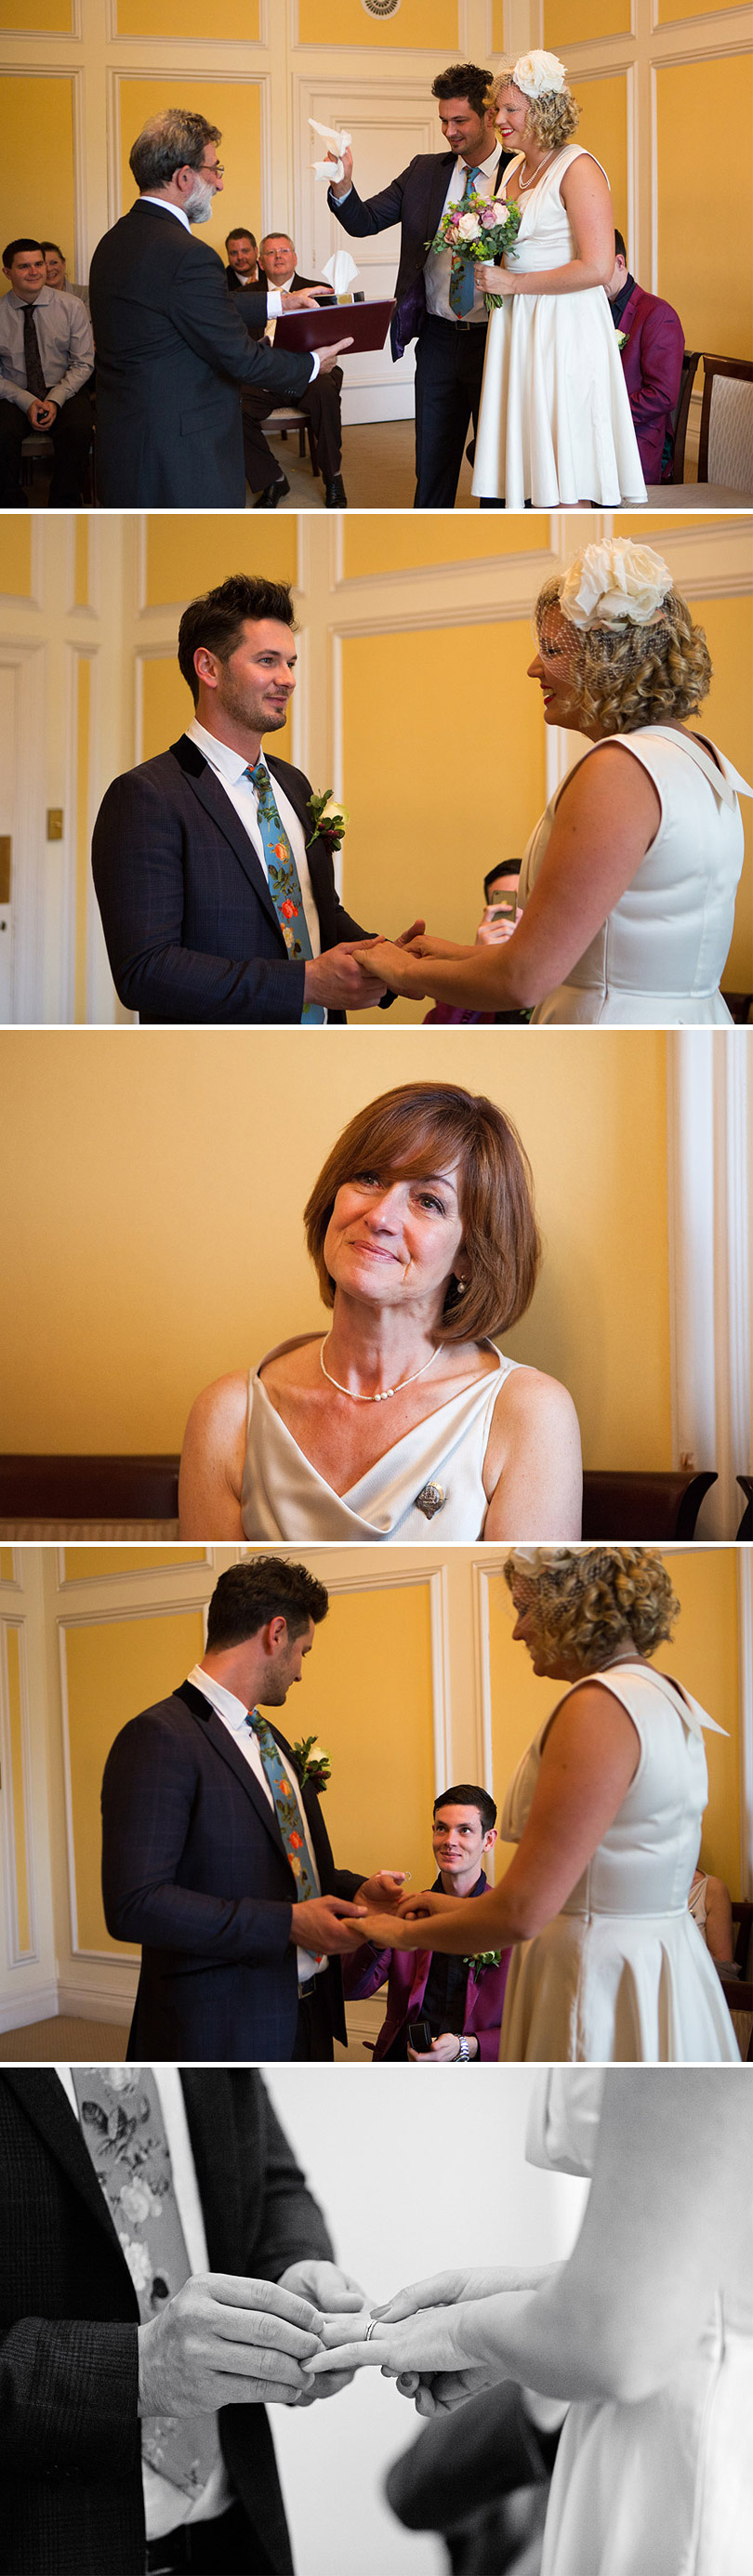 Ben-&-Dee-London-Wedding-7.jpg